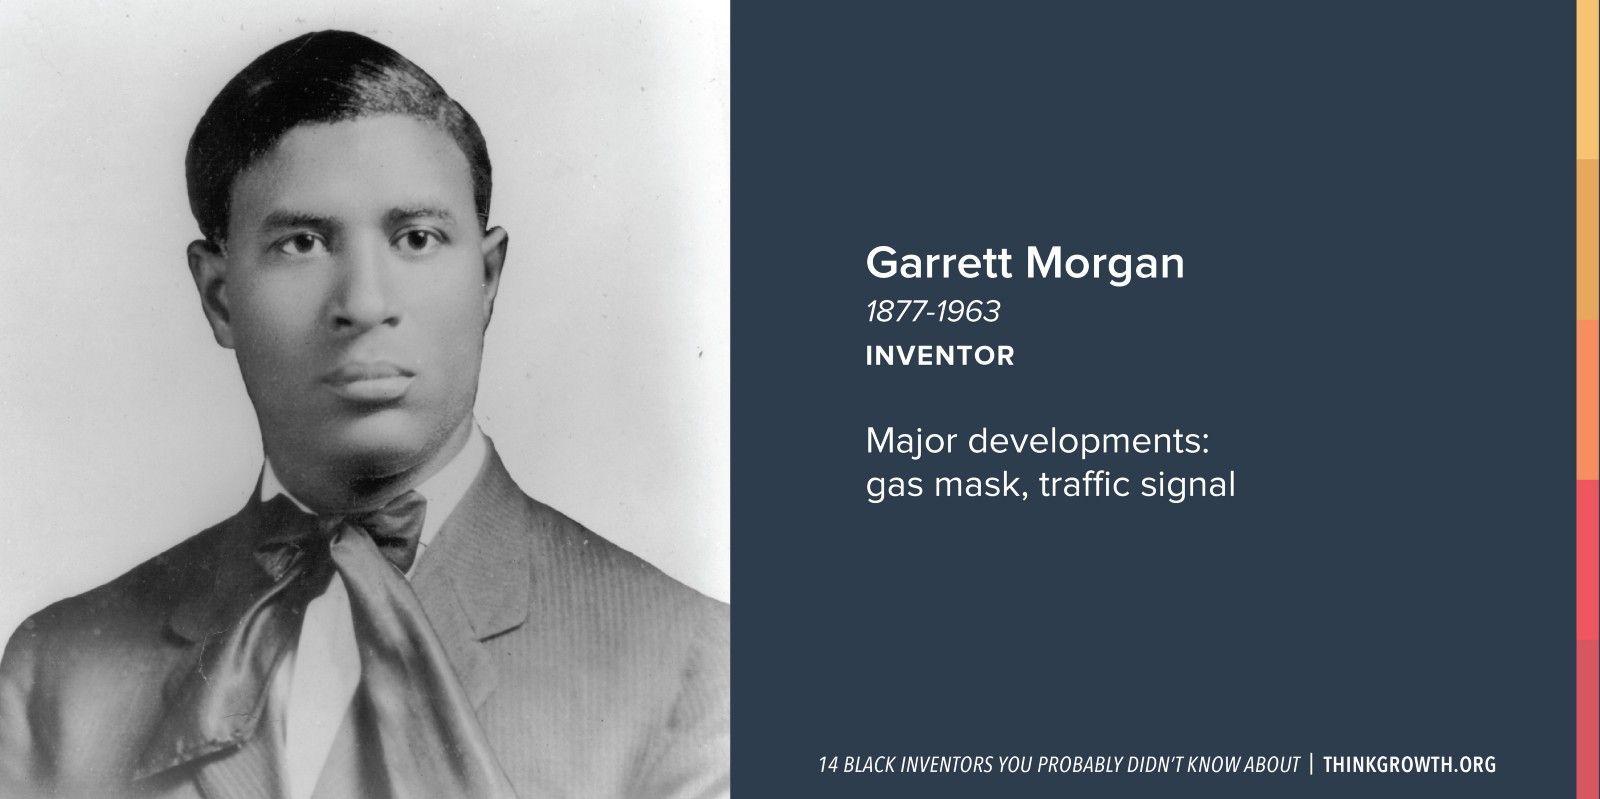 Stop Light   Gas Mask   Garrett Morgan   Morgan First Created The U201csafety  Hoodu201d To Help Firefighters Navigate Smokey Buildings, Later Modifying It To  Carry ...